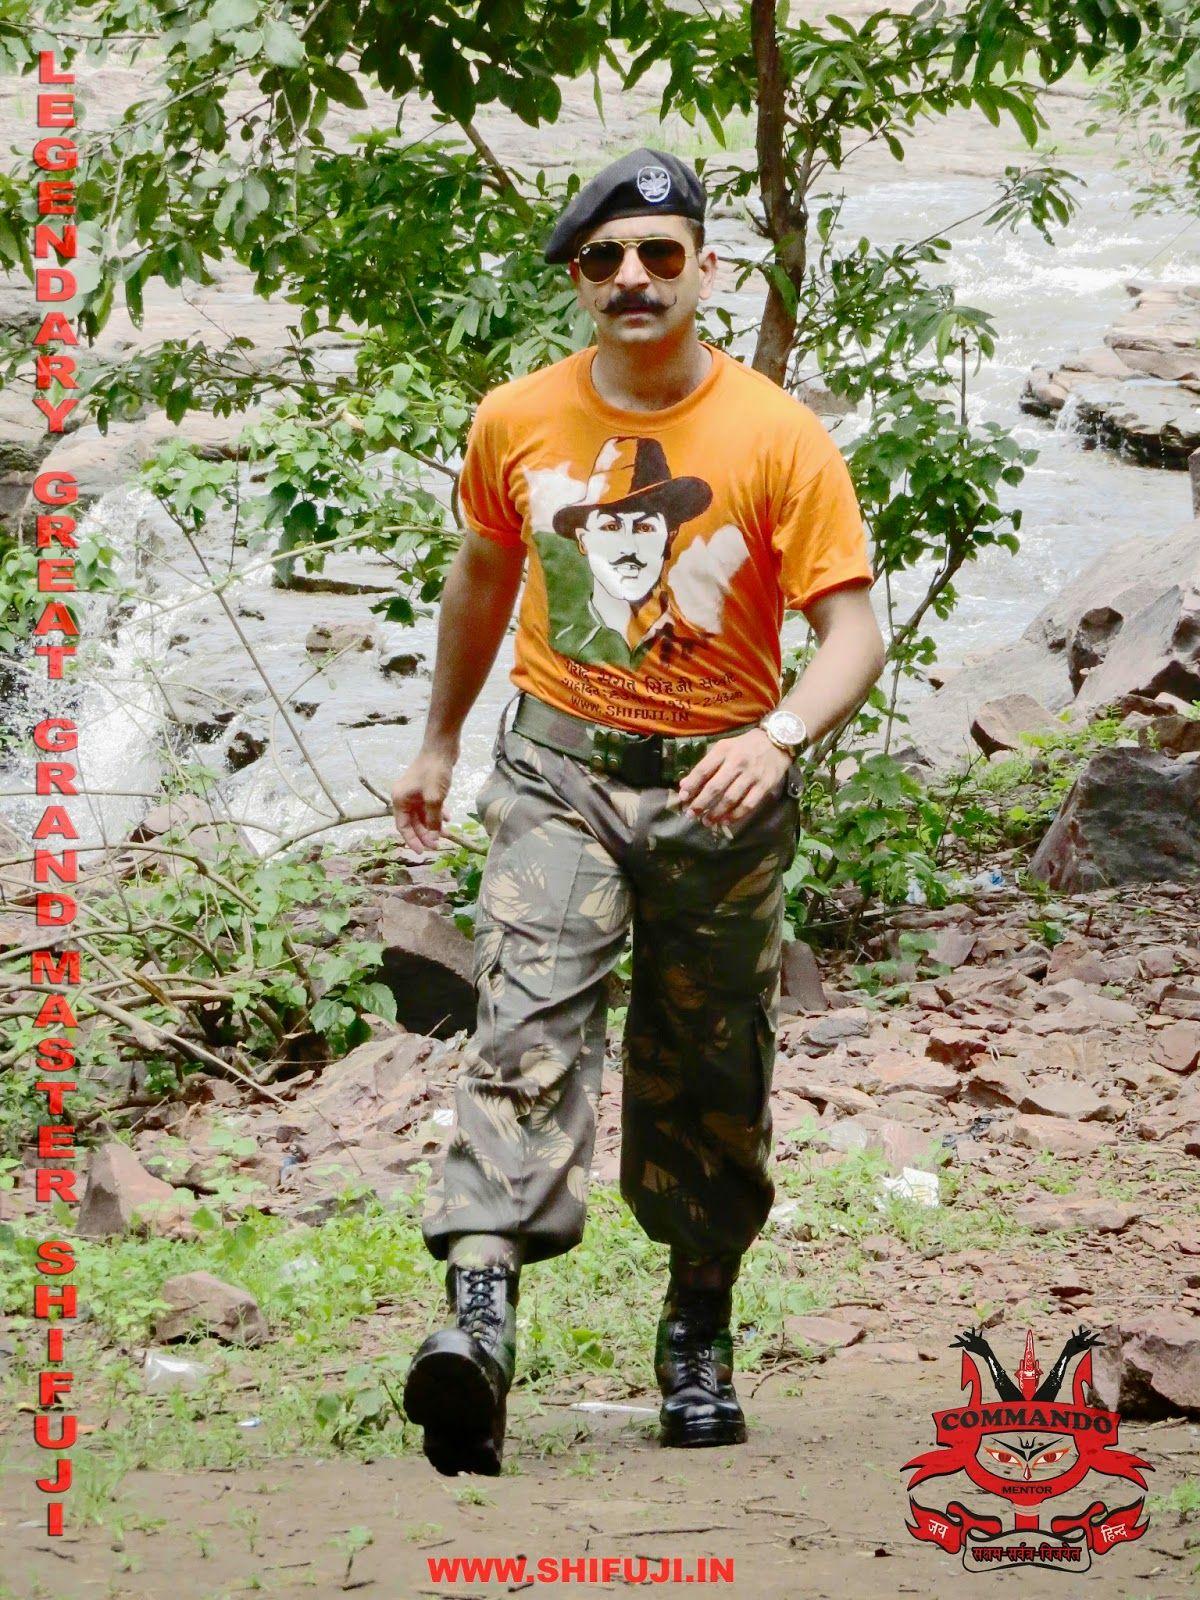 Indian Army Commando Trainer The World S Best Commando Trainer Grandmaster Shifuji Shaurya Bharadwaj Indian Army Army Love Army